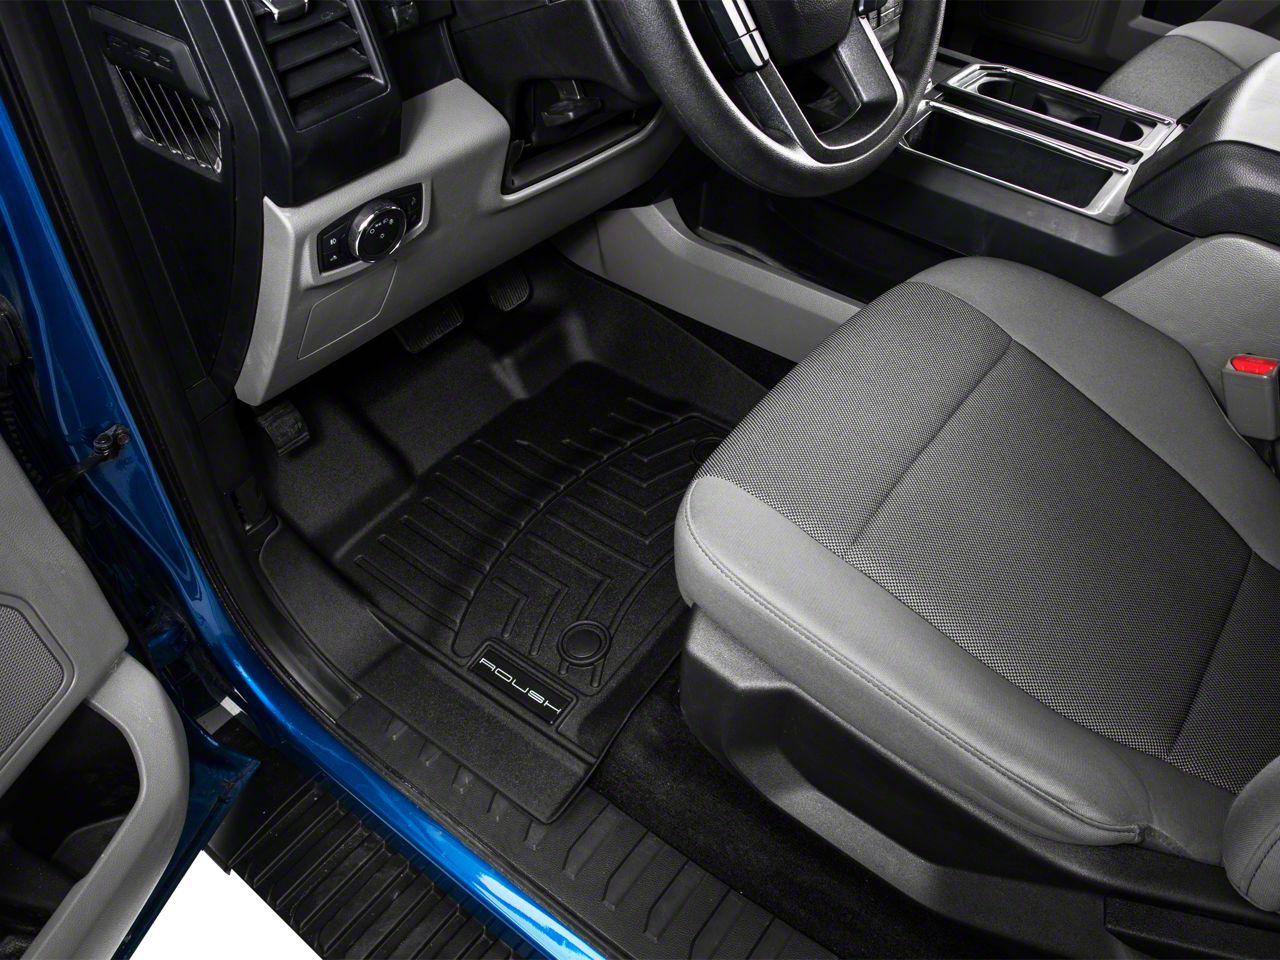 Roush by WeatherTech DigitalFit Front & Rear FloorLiners - Black (15-19 F-150 SuperCrew)